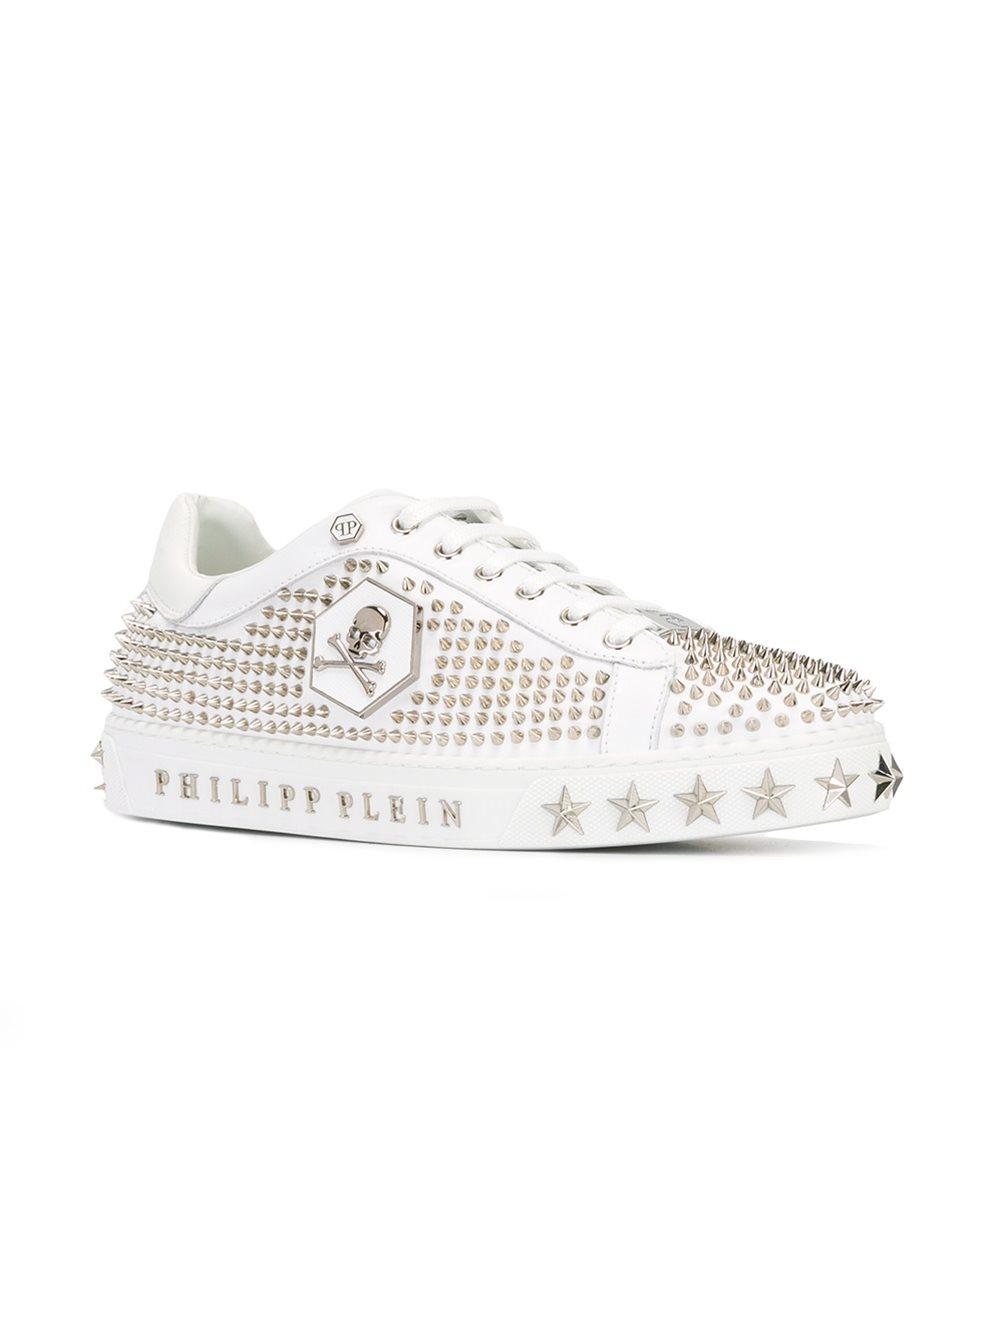 Philipp Plein Leather 'toronto City' Sneakers in White